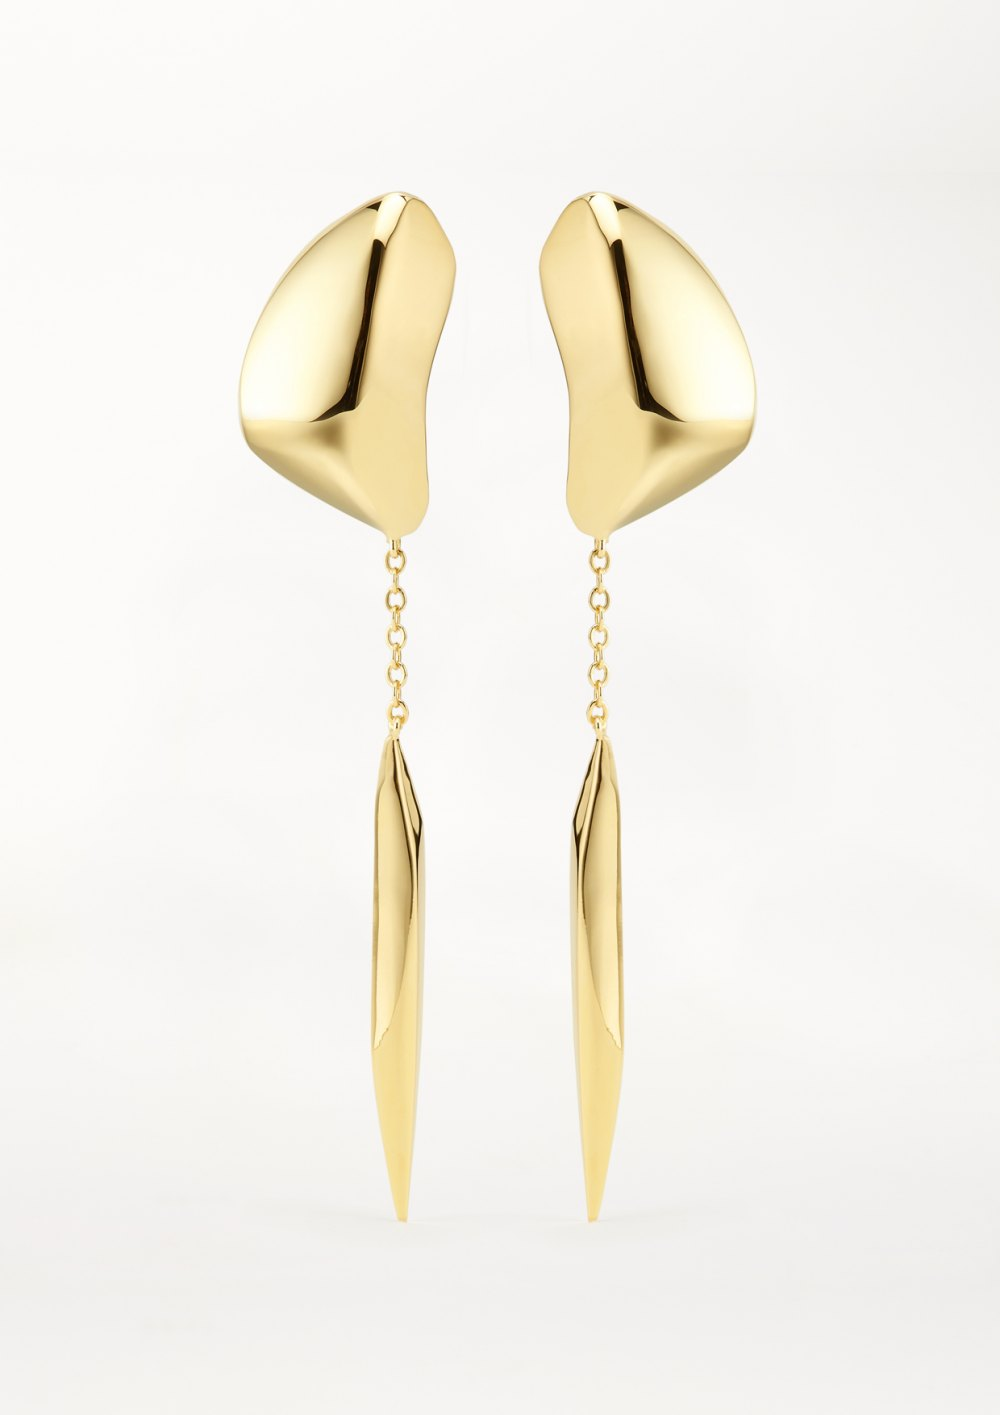 Mercury Drop Ohrring mit langer kette skulpturaler langer Anhänger in Gold xeniabous